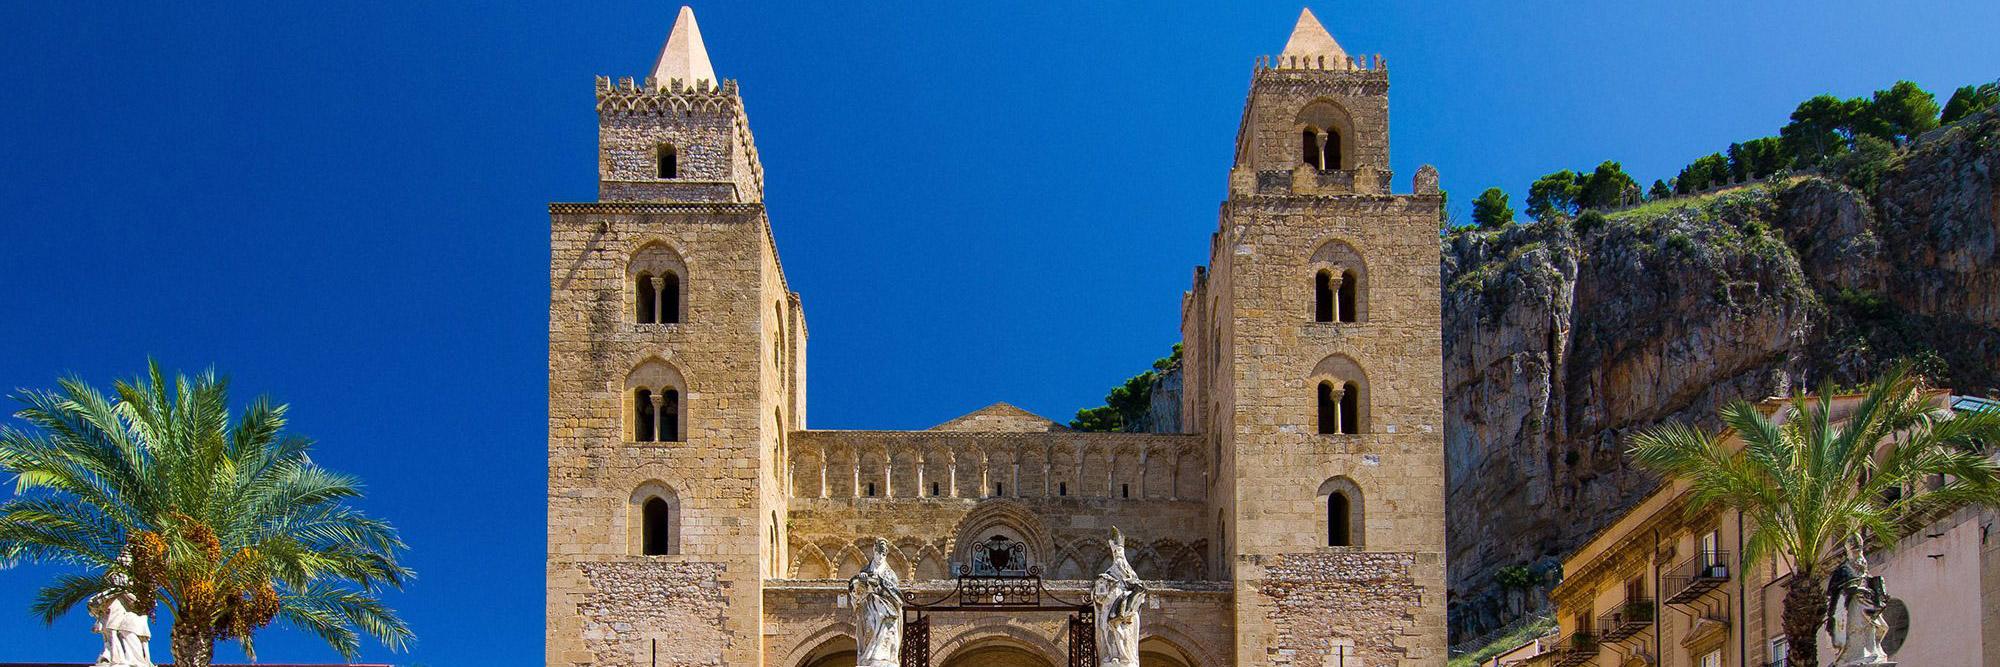 cattedrale-di-cefalu-unesco-magazine